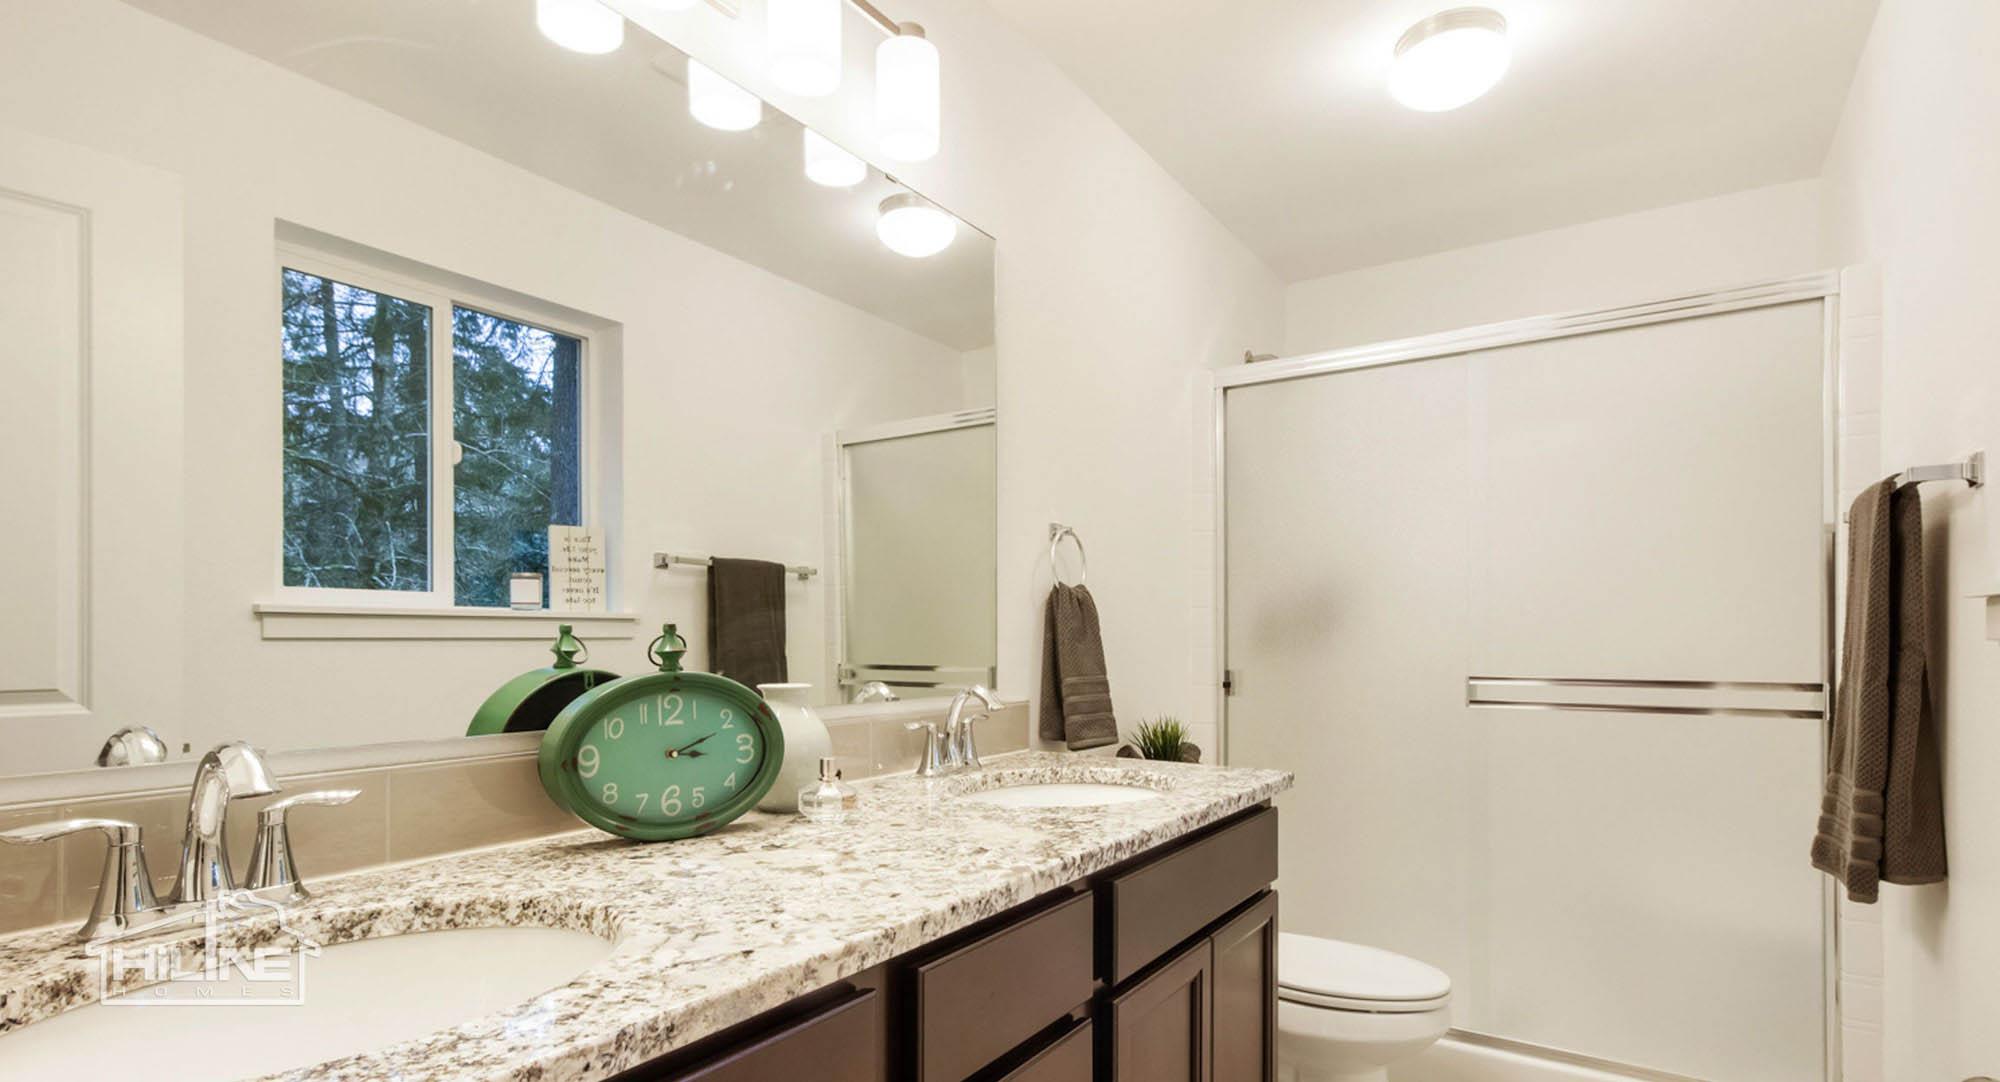 HiLine Home Plan 1491 Master Bath